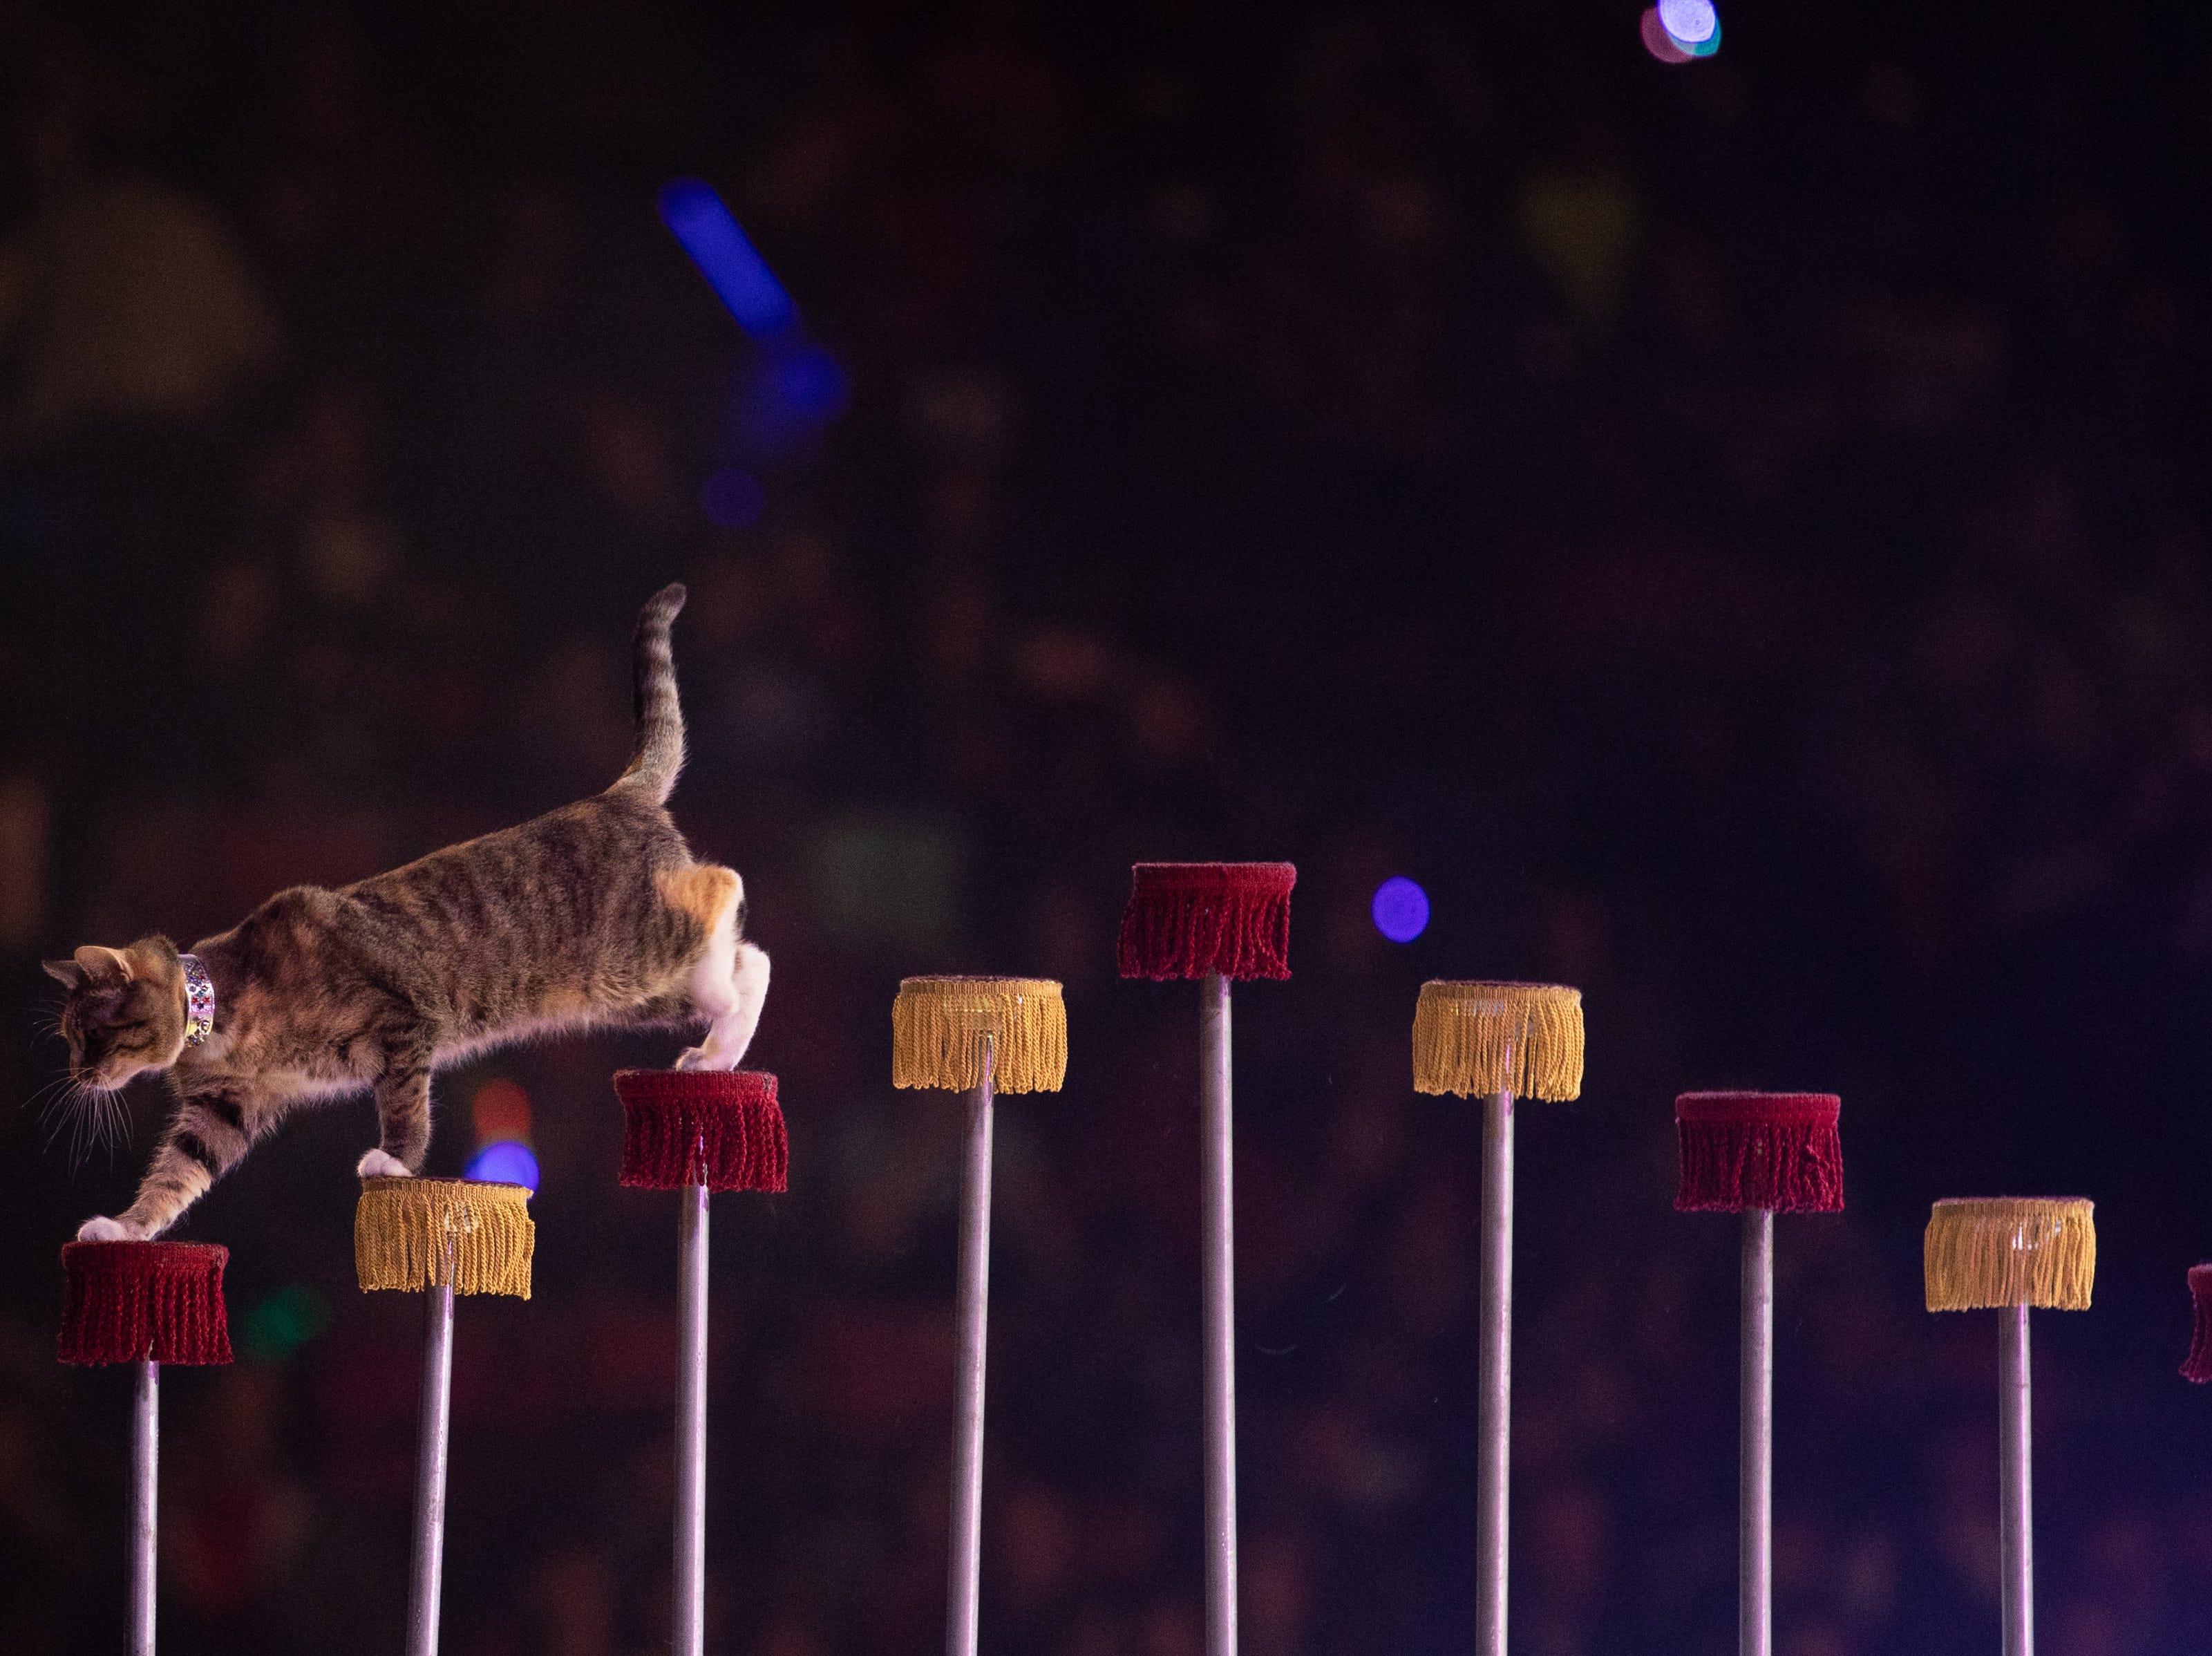 An agile feline performs during the Kosair Shrine Circus, Saturday, Feb. 9, 2019 in Louisville Ky.